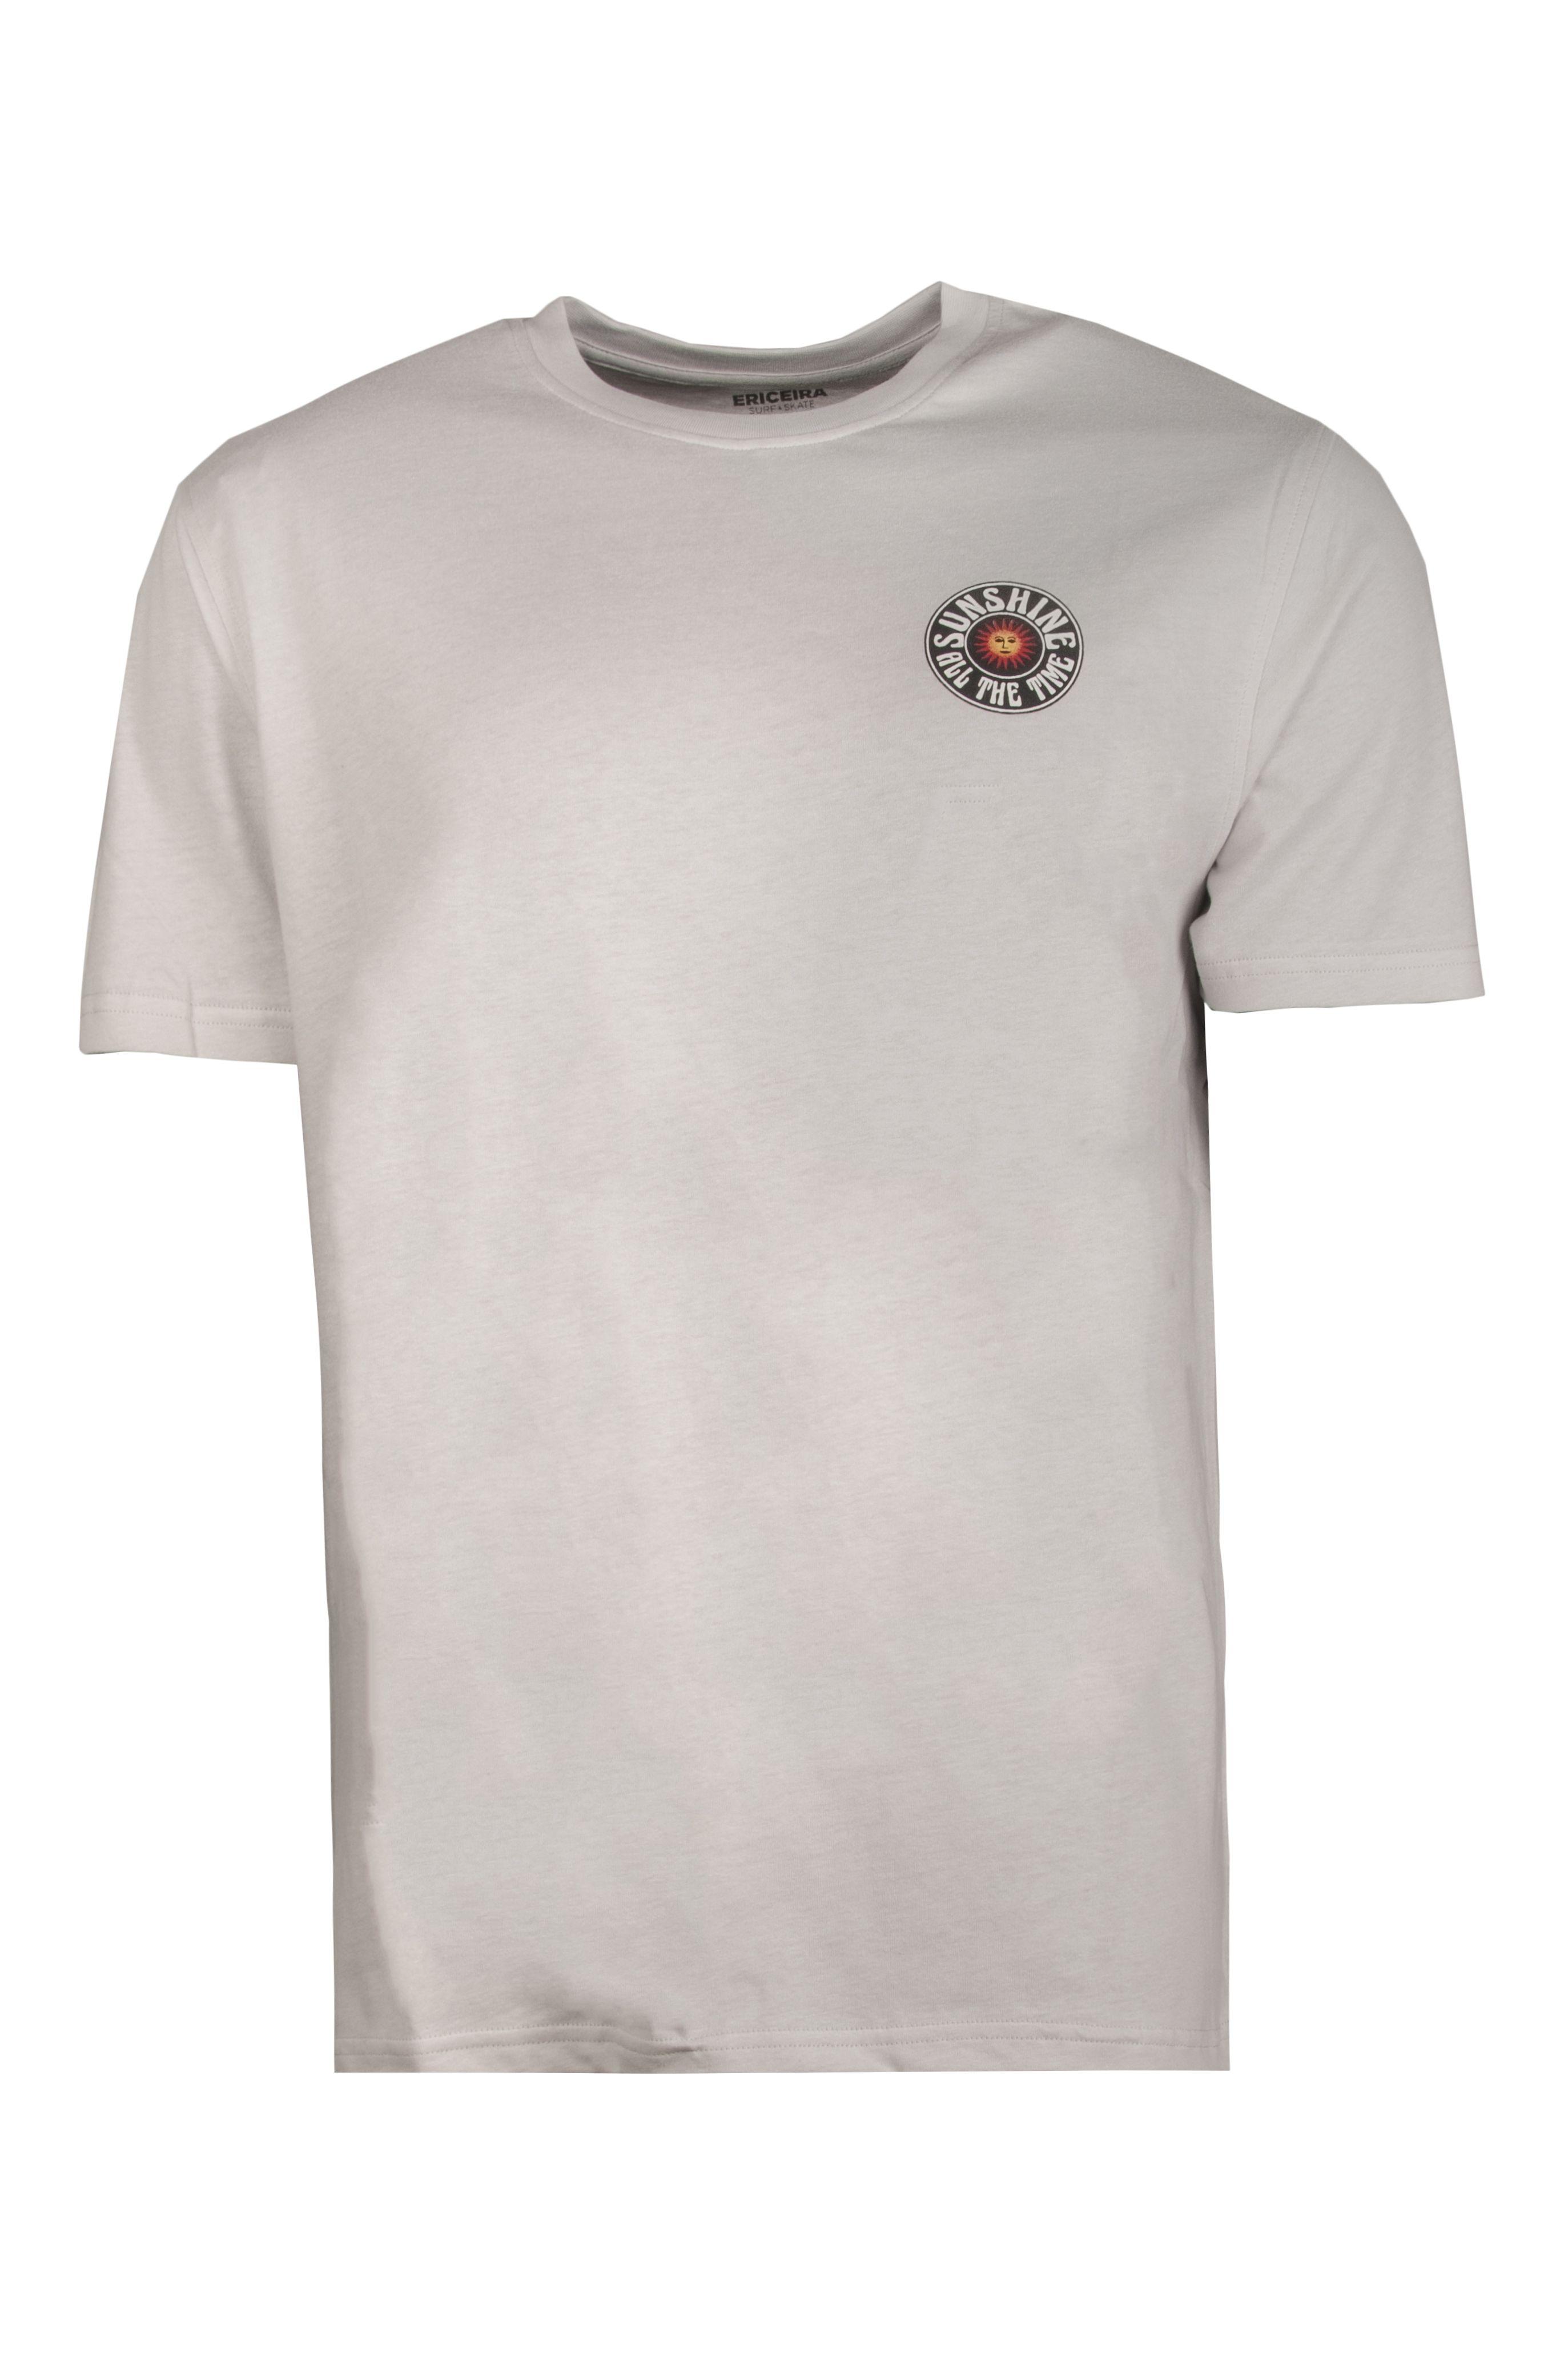 T-Shirt Ericeira Surf Skate SUN SMILE Off White